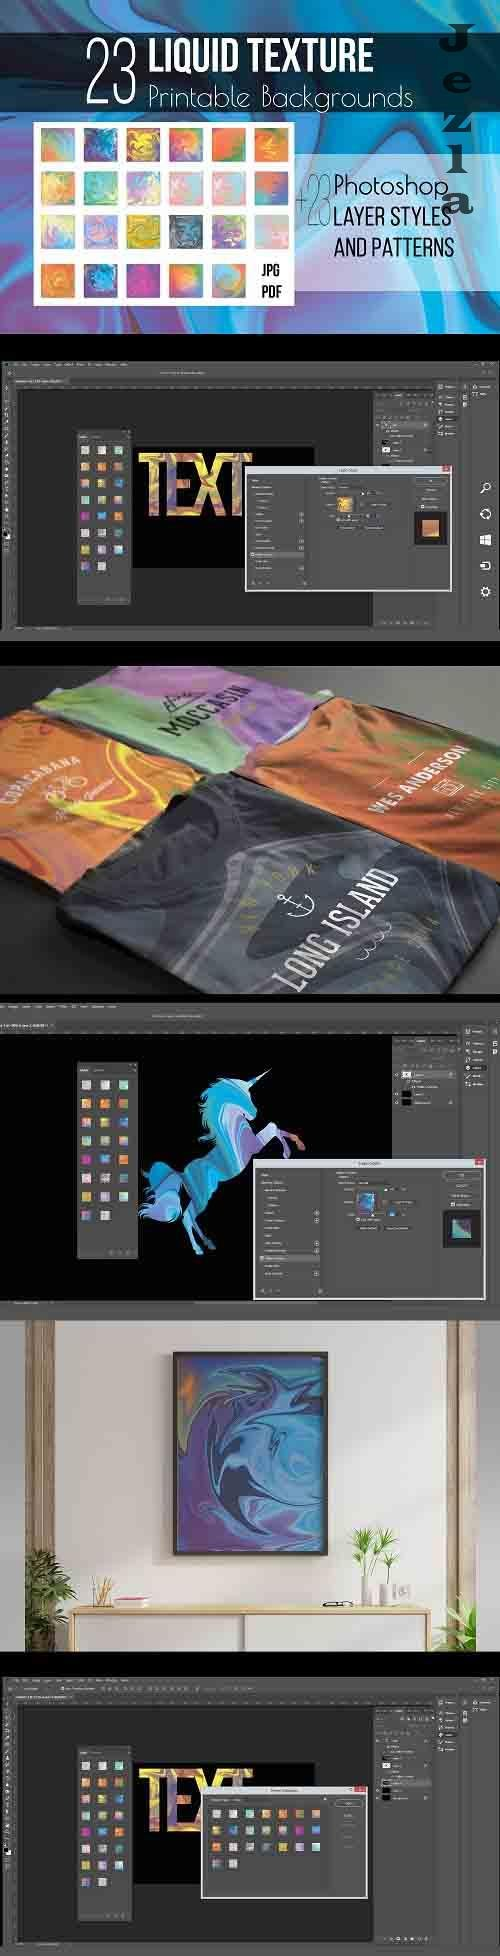 Liquid texture & PHSP Layer Styles - 1268816